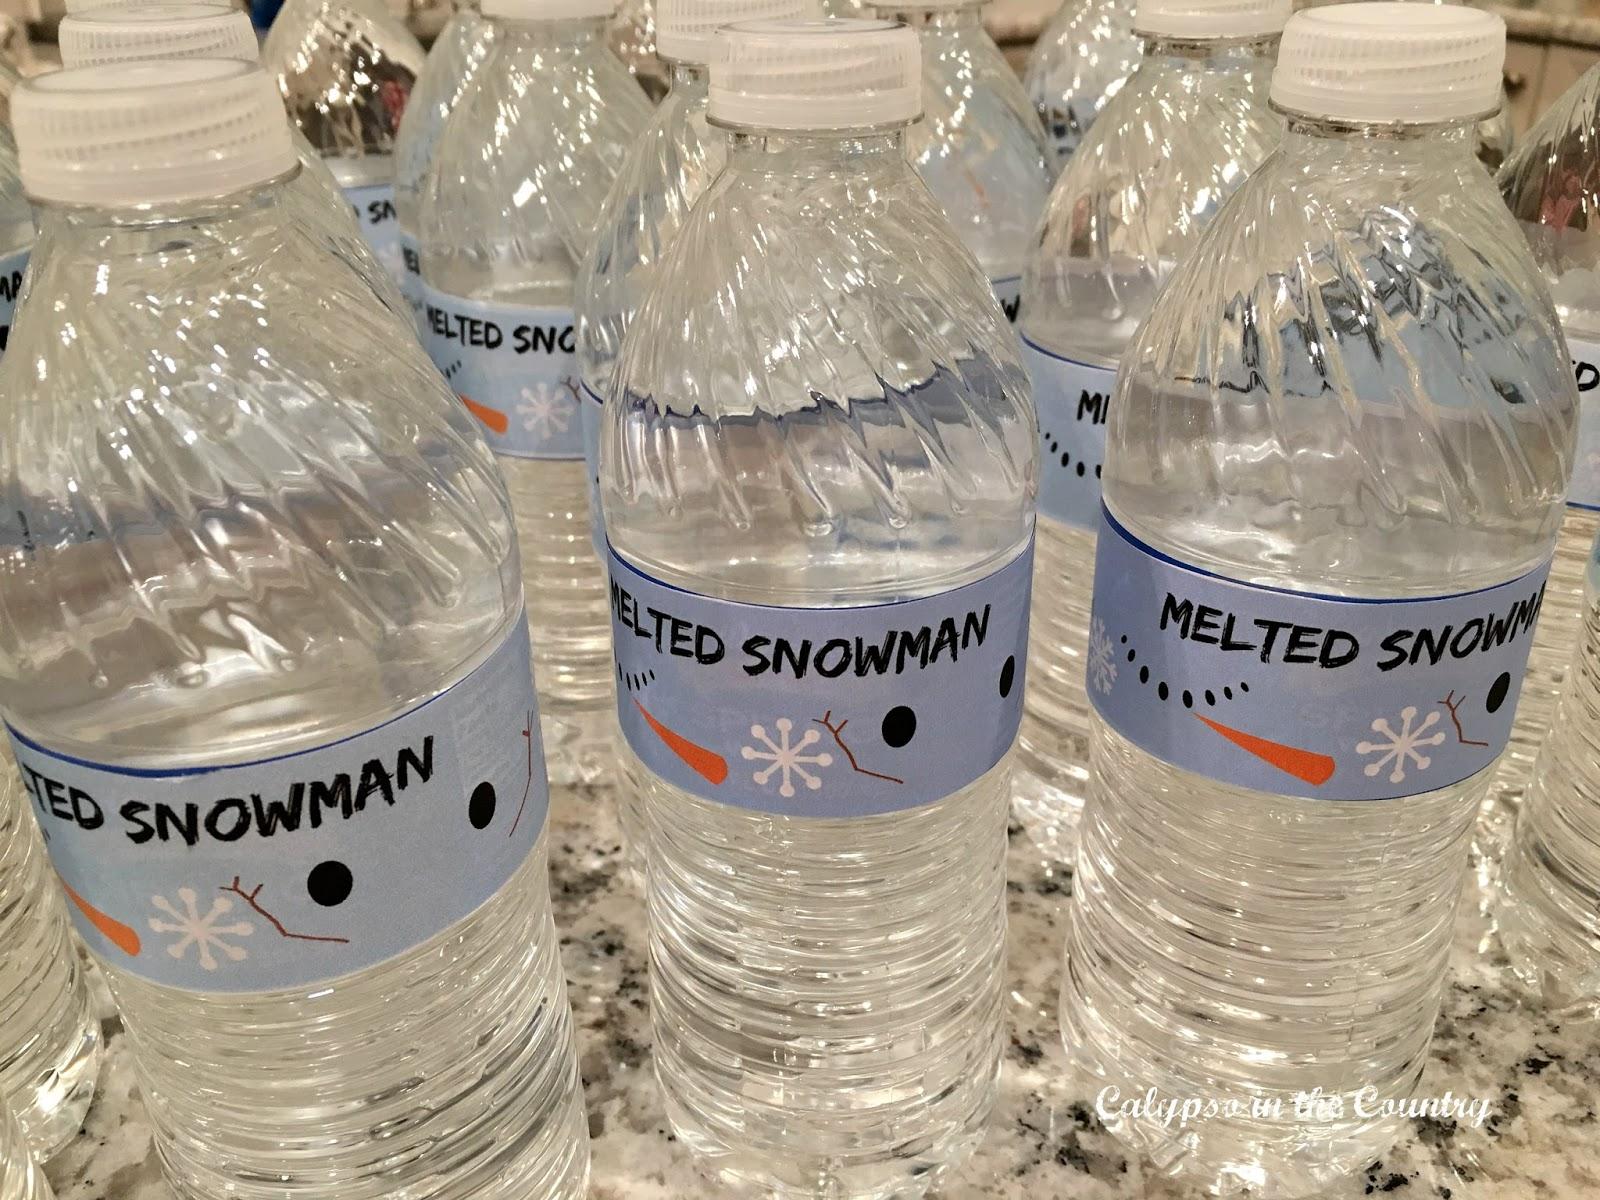 Melted snowman water bottles for bottle flipping